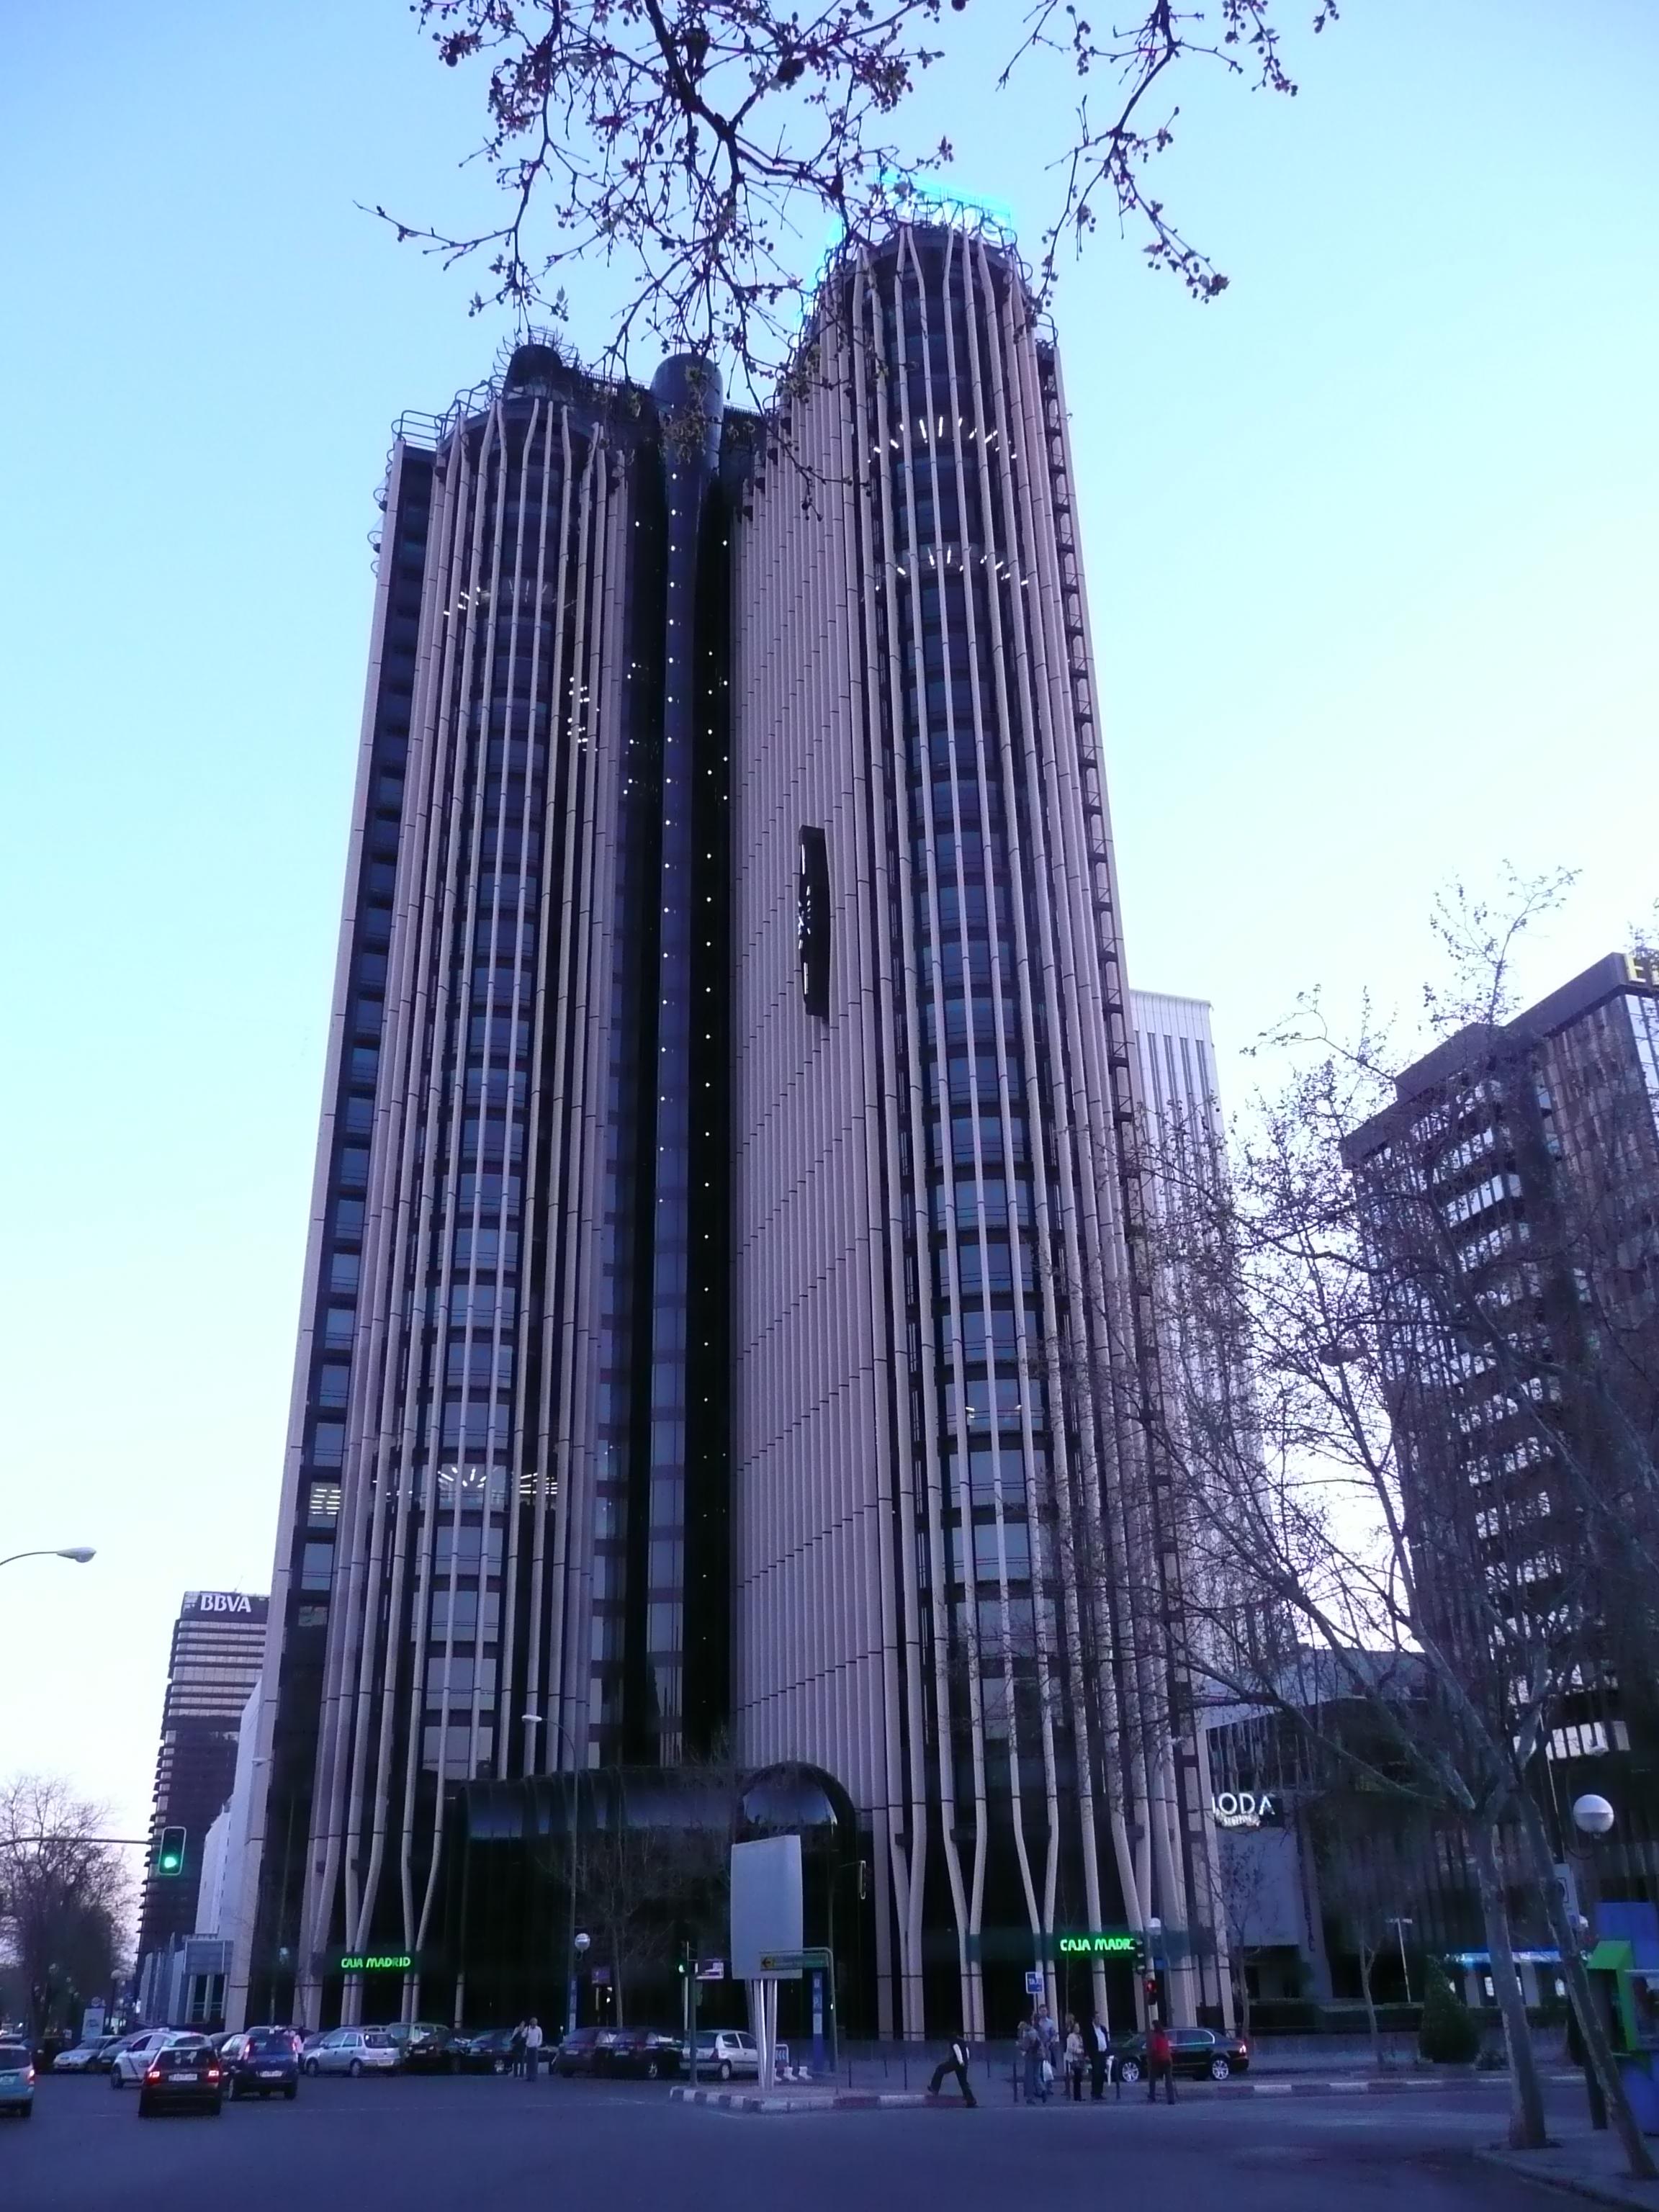 File:Torre Europa (Madrid) 10.jpg - Wikimedia Commons